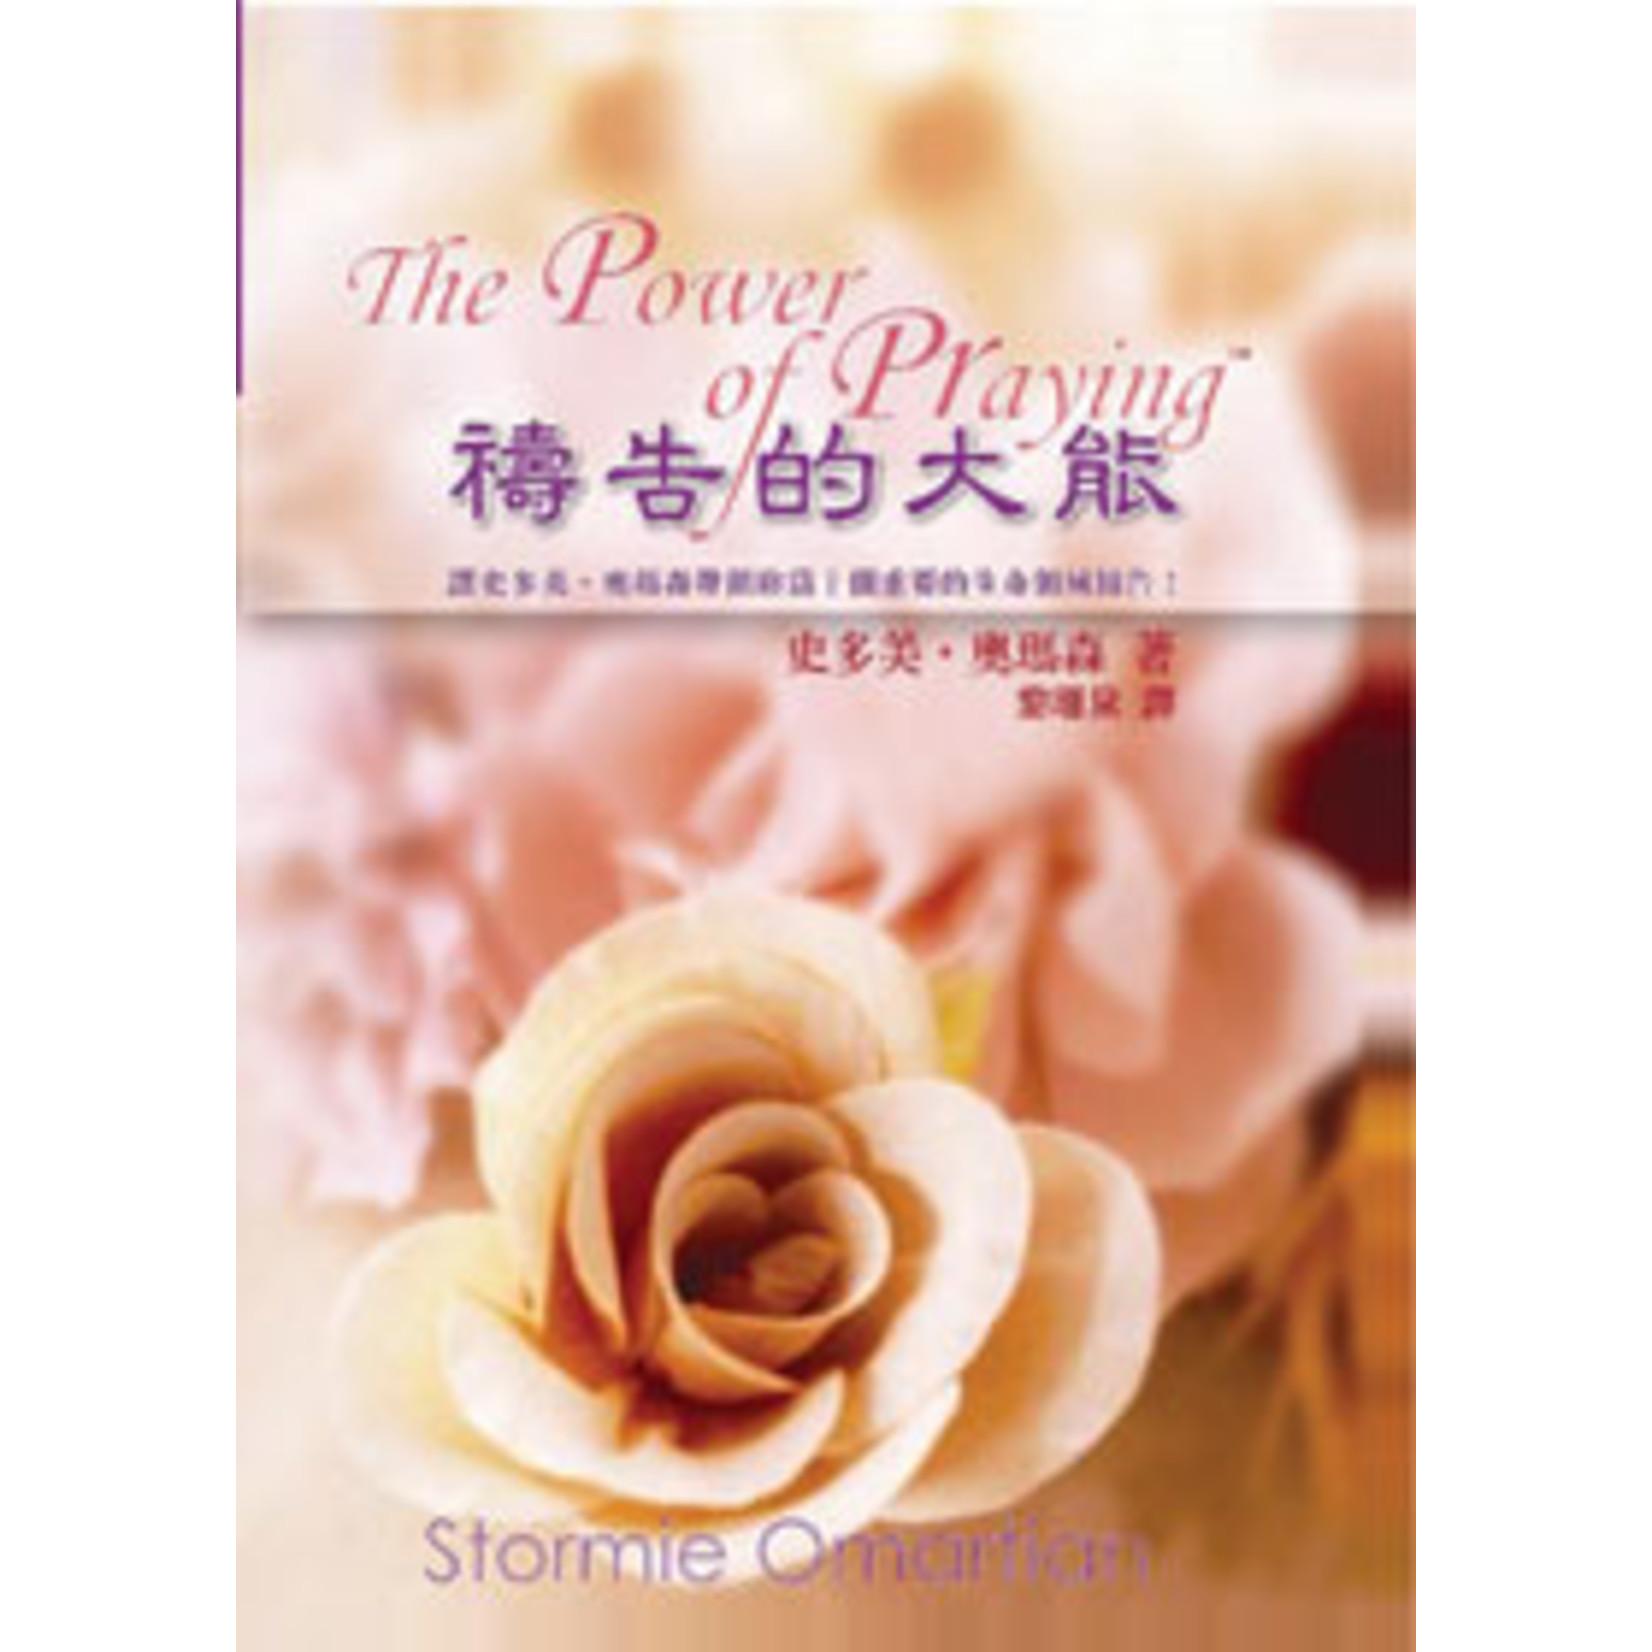 以琳 Elim (TW) 禱告的大能 The Power of Praying